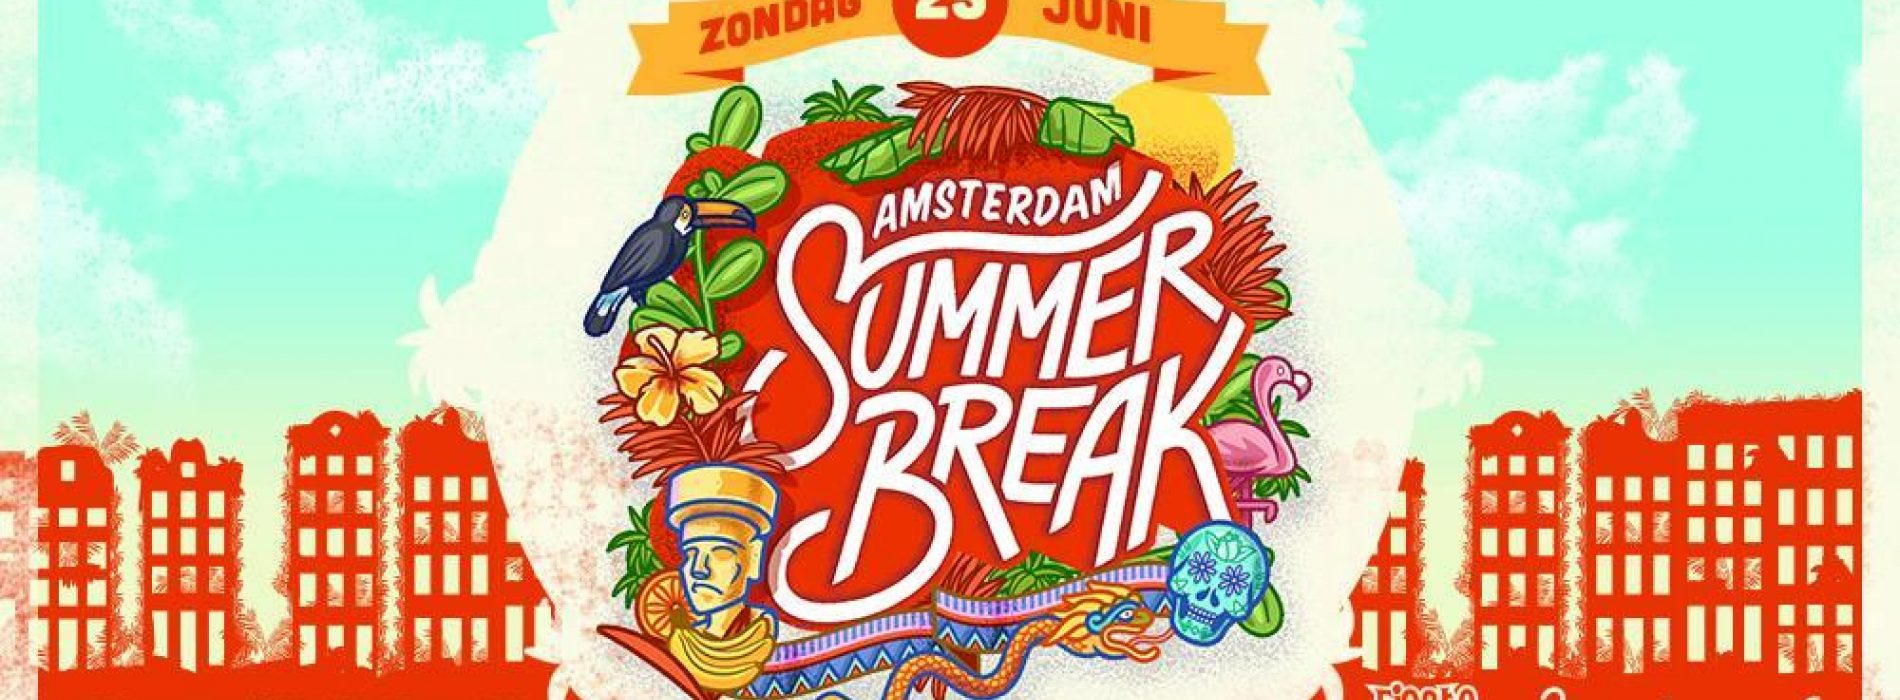 Amsterdam Summer Break Festival | Stadspodium Amsterdam